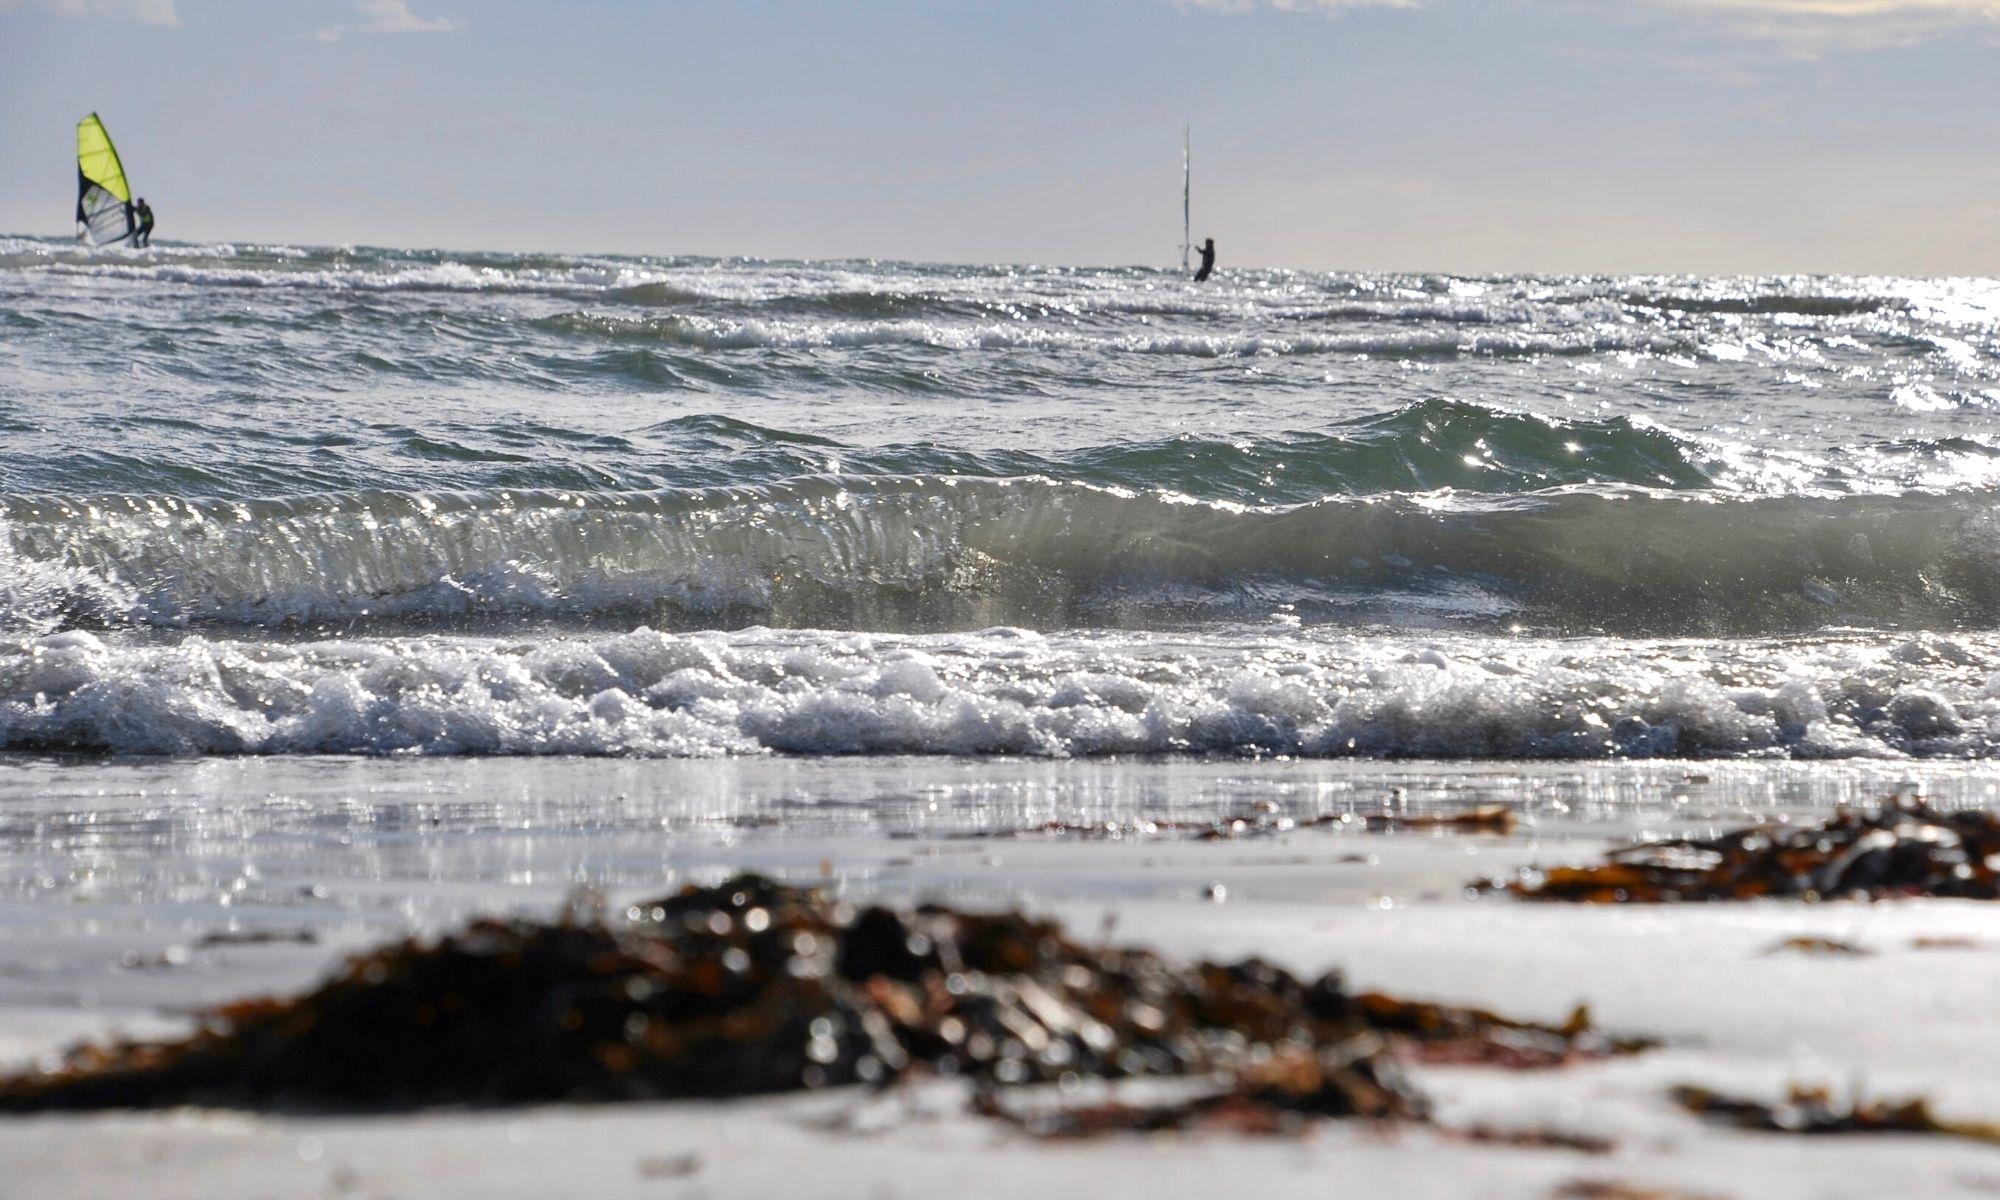 gå vindsurfingkurs i apelviken